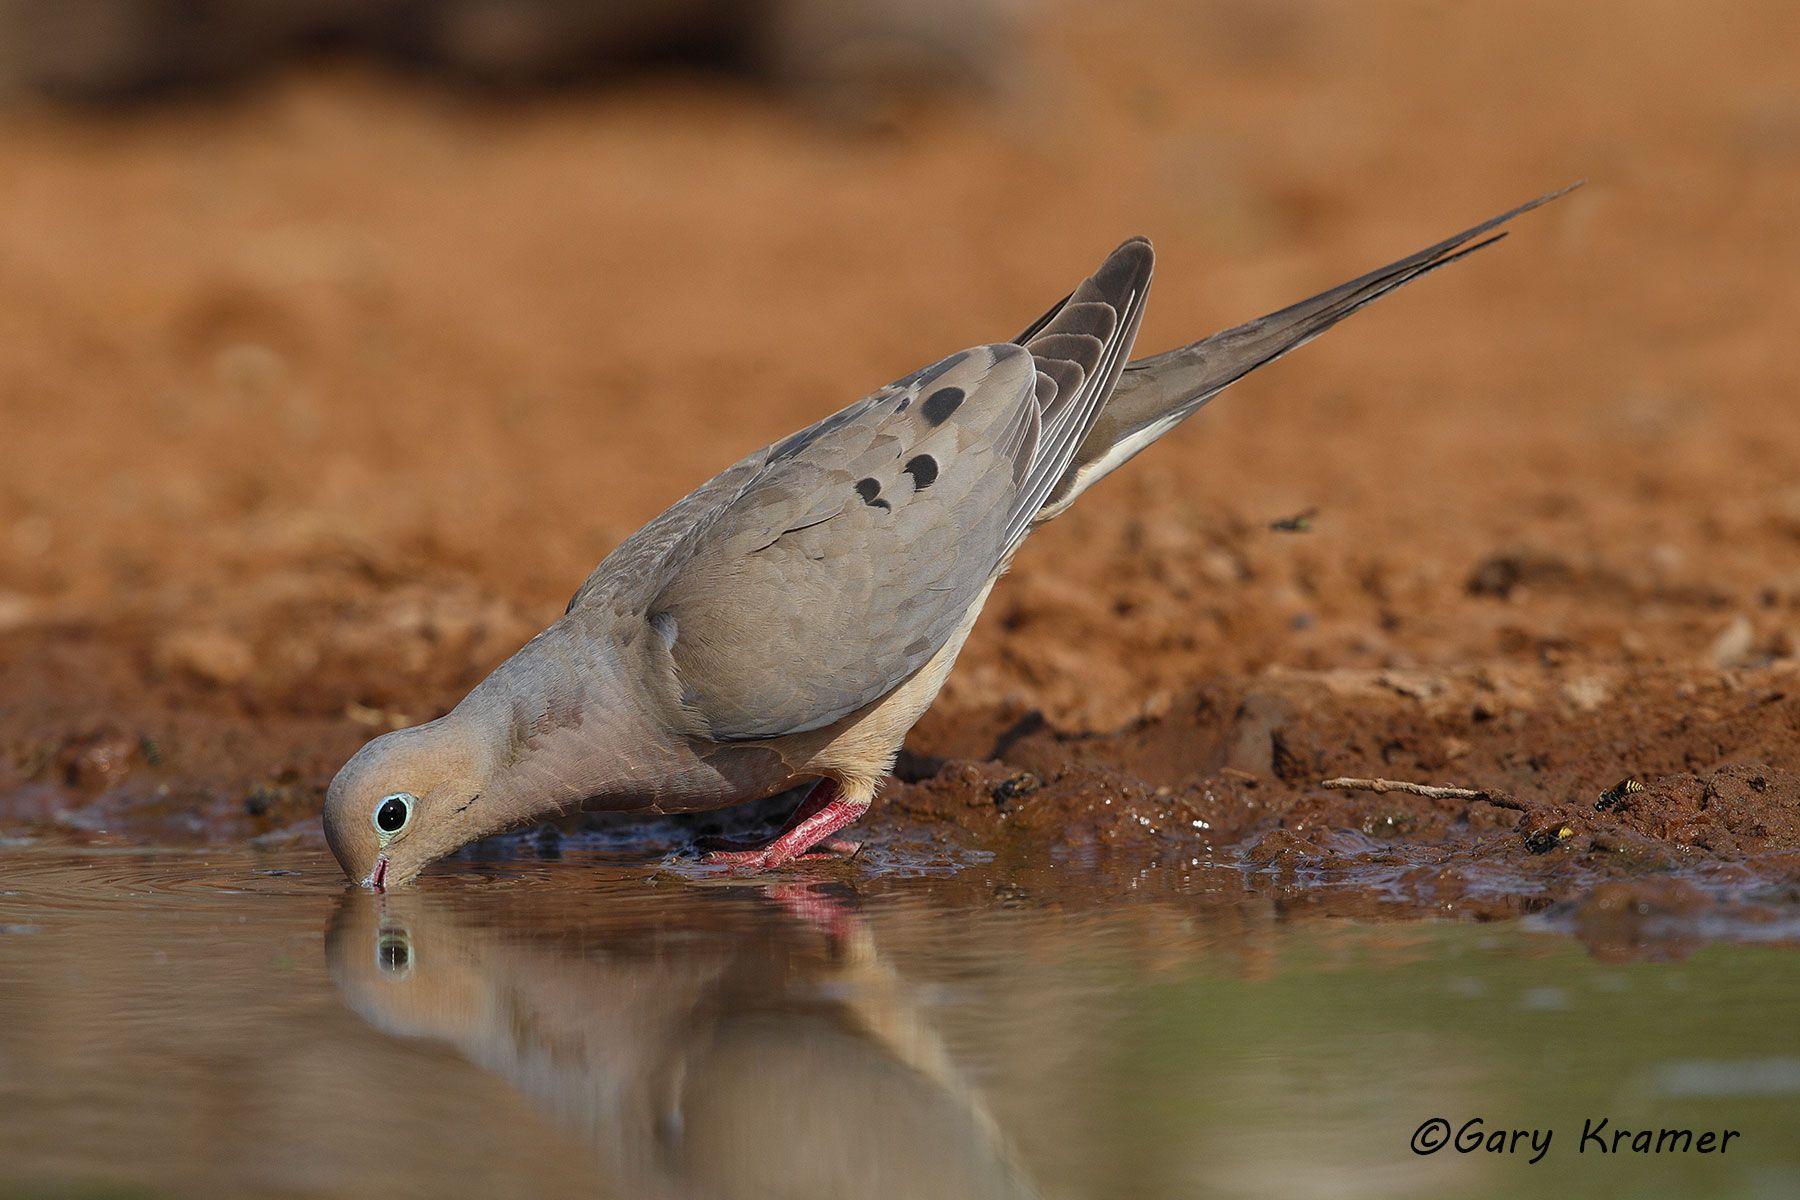 Mourning Dove (Zenaida macroura) - NBDM#440d